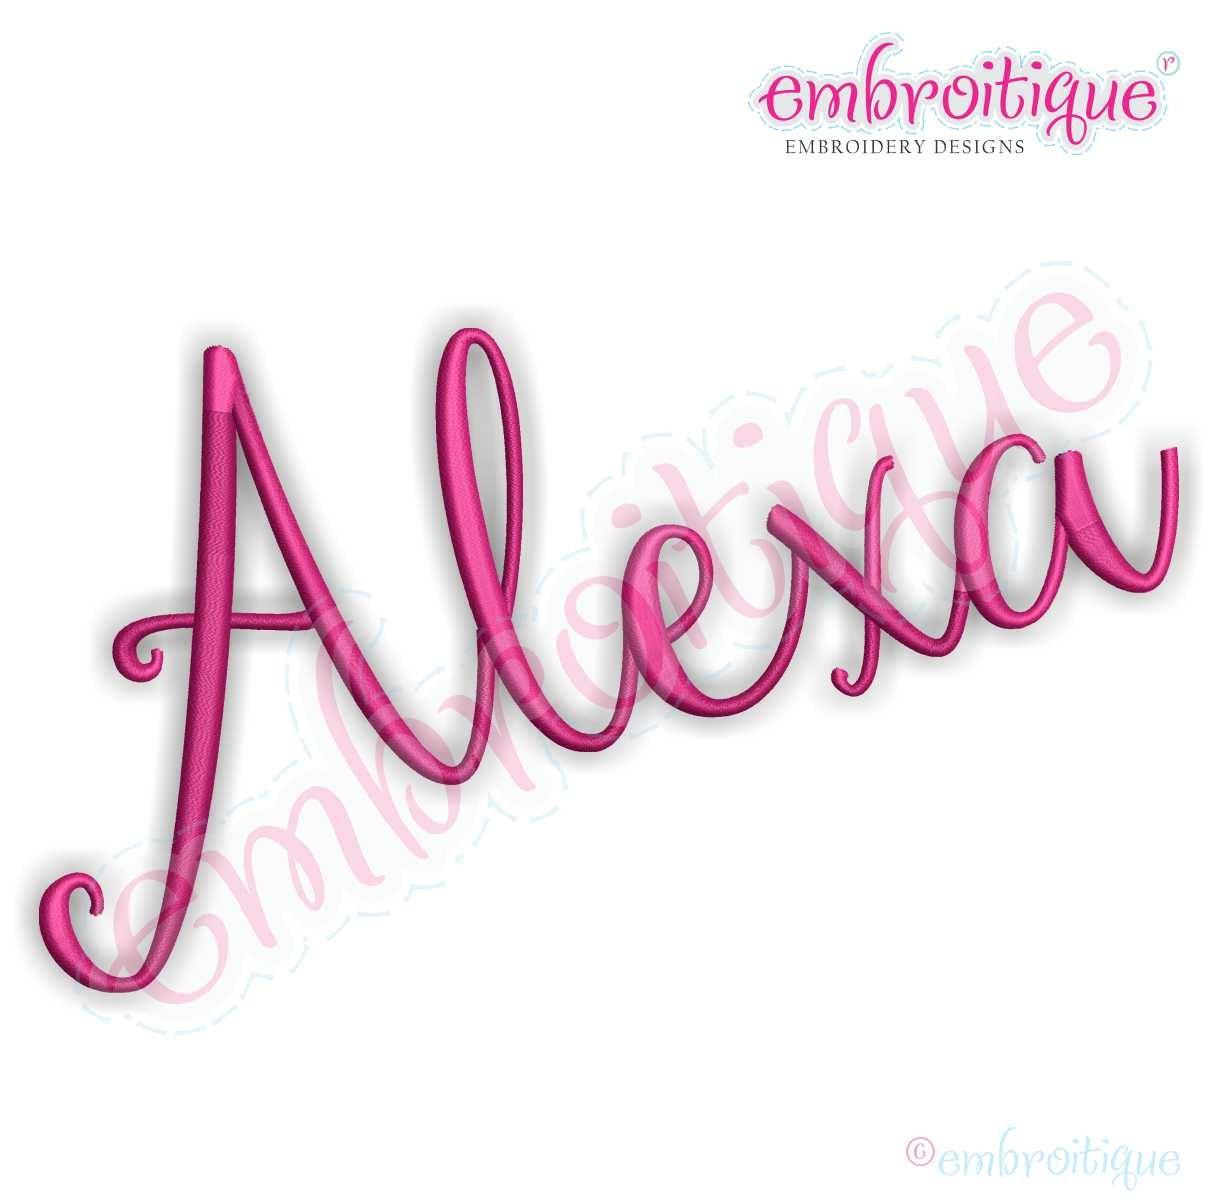 Alexa hand letterered calligraphy machine embroidery monogram